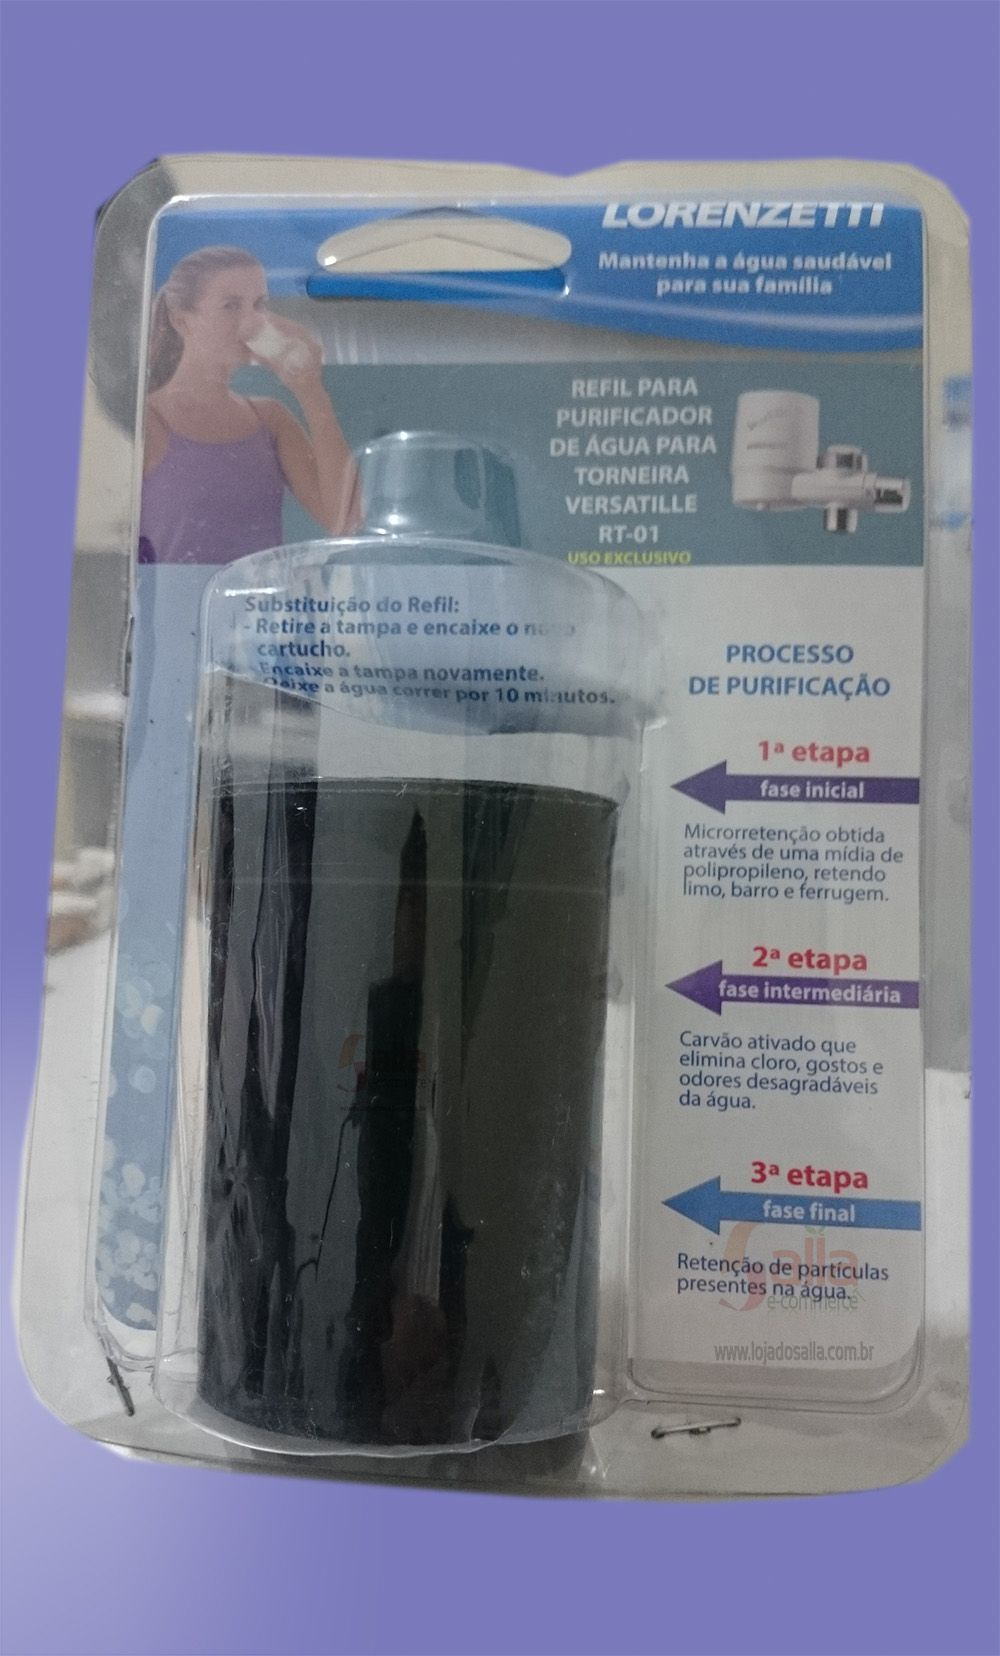 Refil / Filtro para Purificador de Água Torneira Versatille RT-01 Lorenzetti